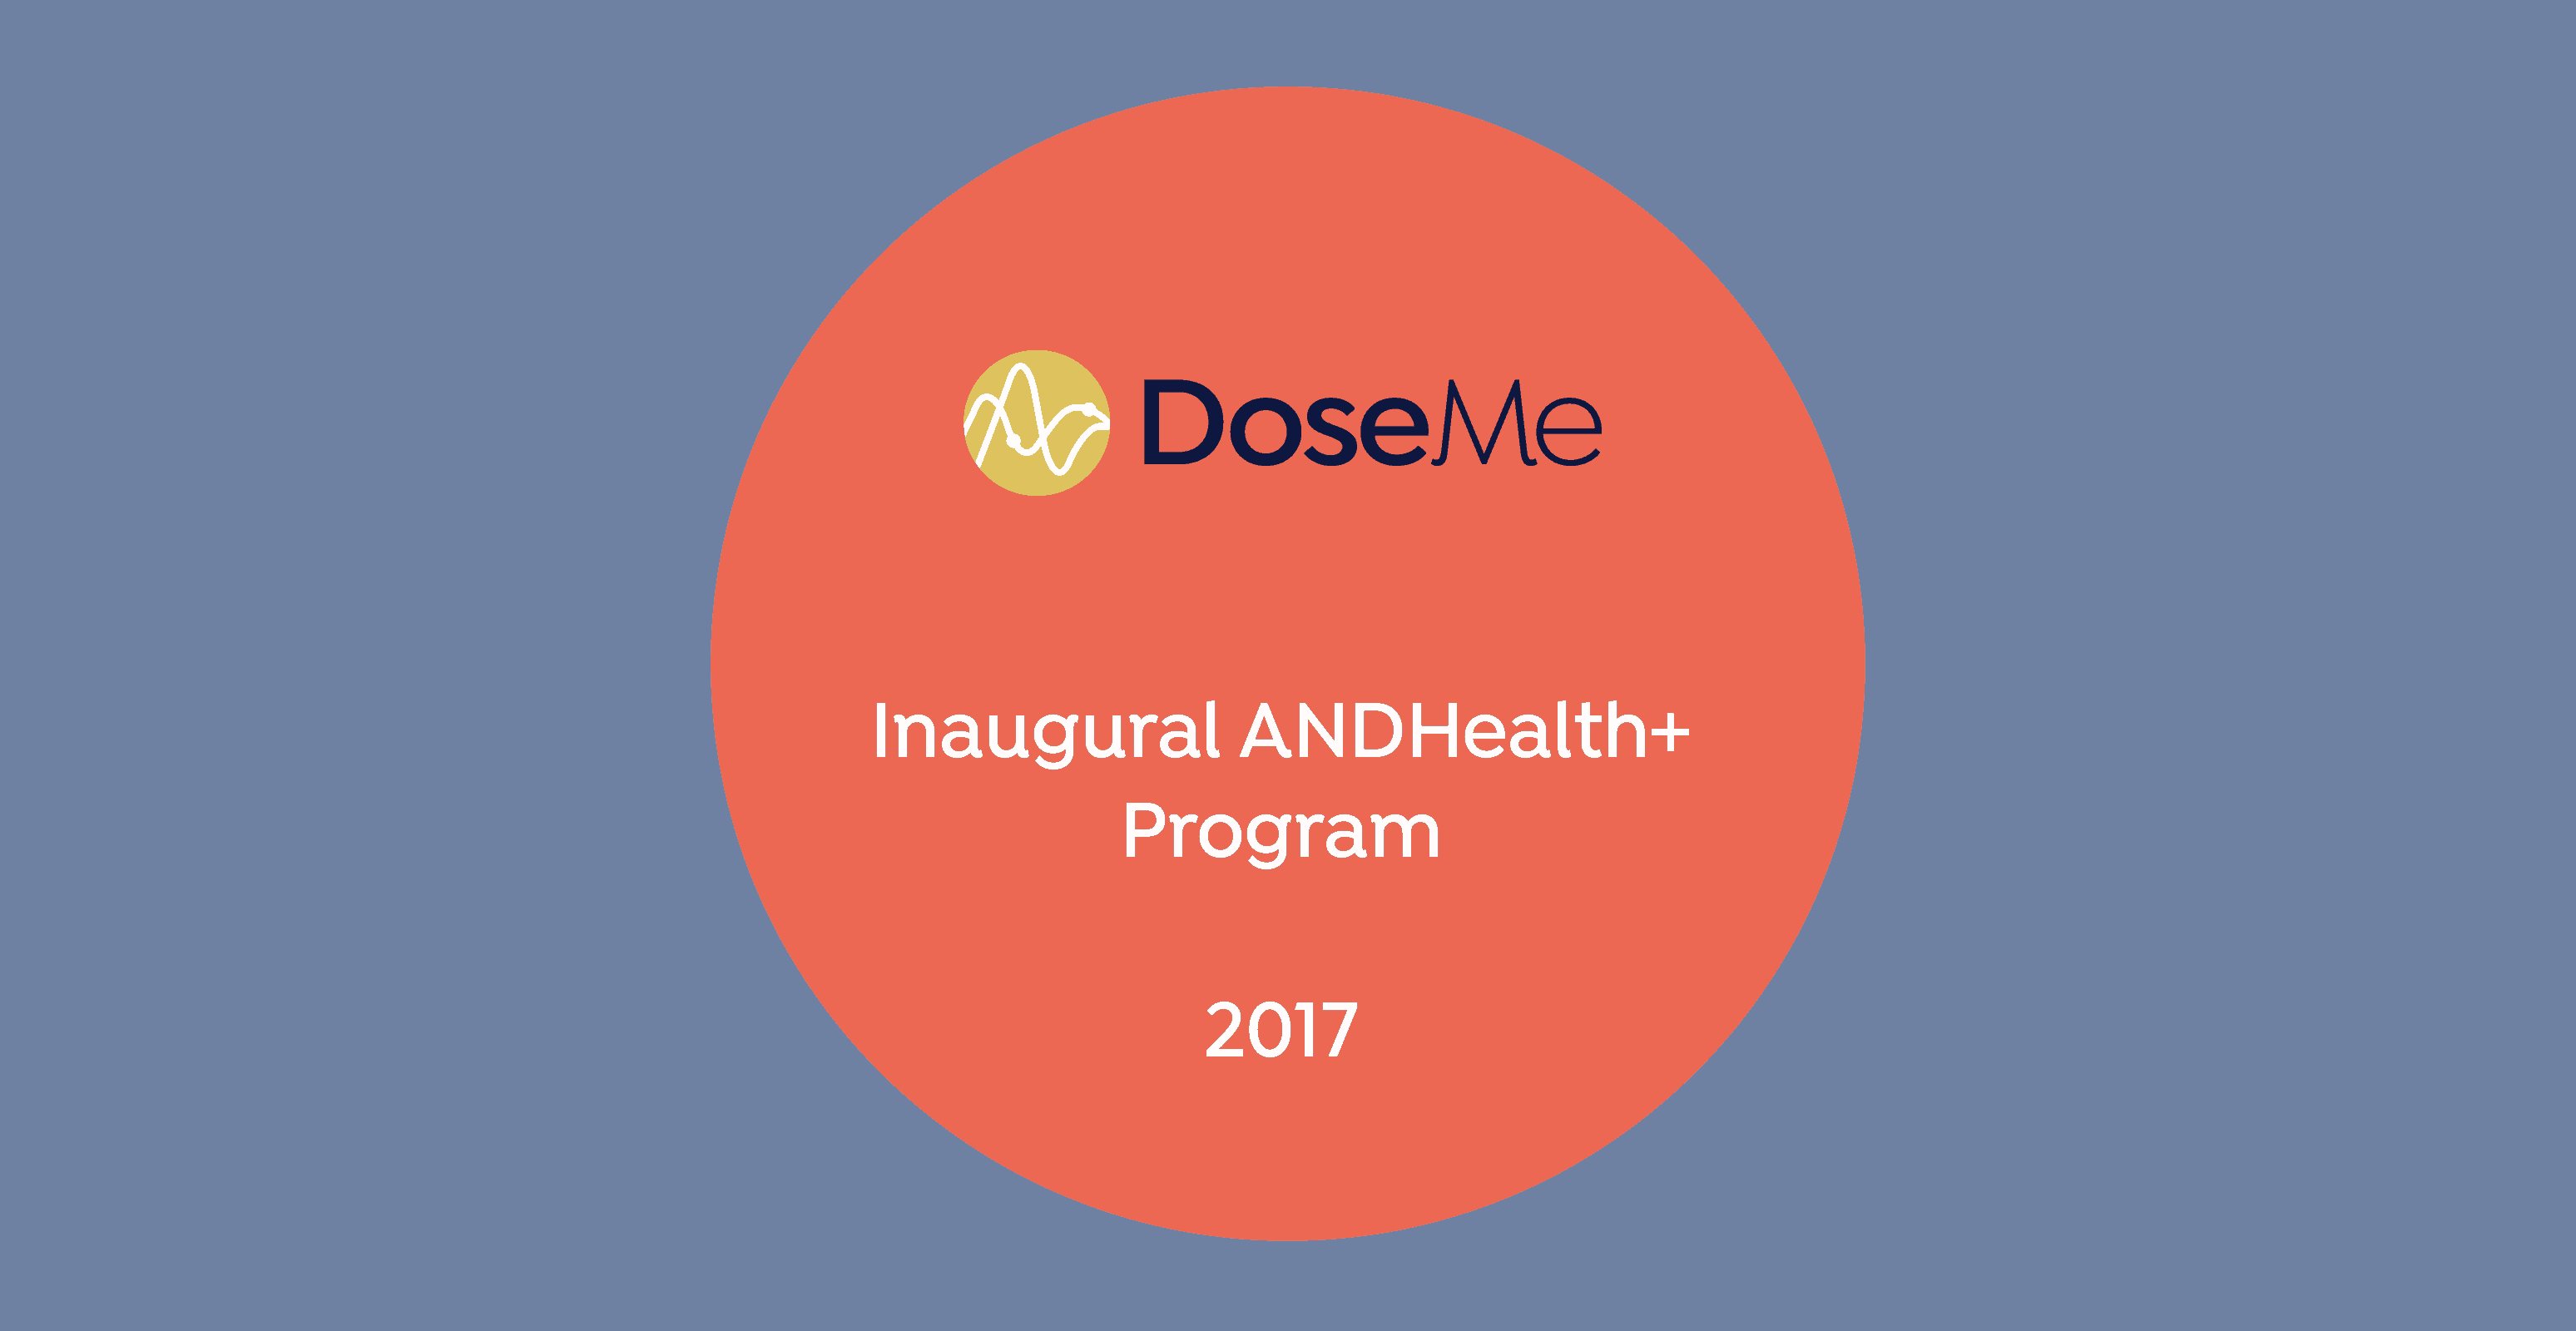 DoseMe Wins Place in Inaugural ANDHealth+ Program